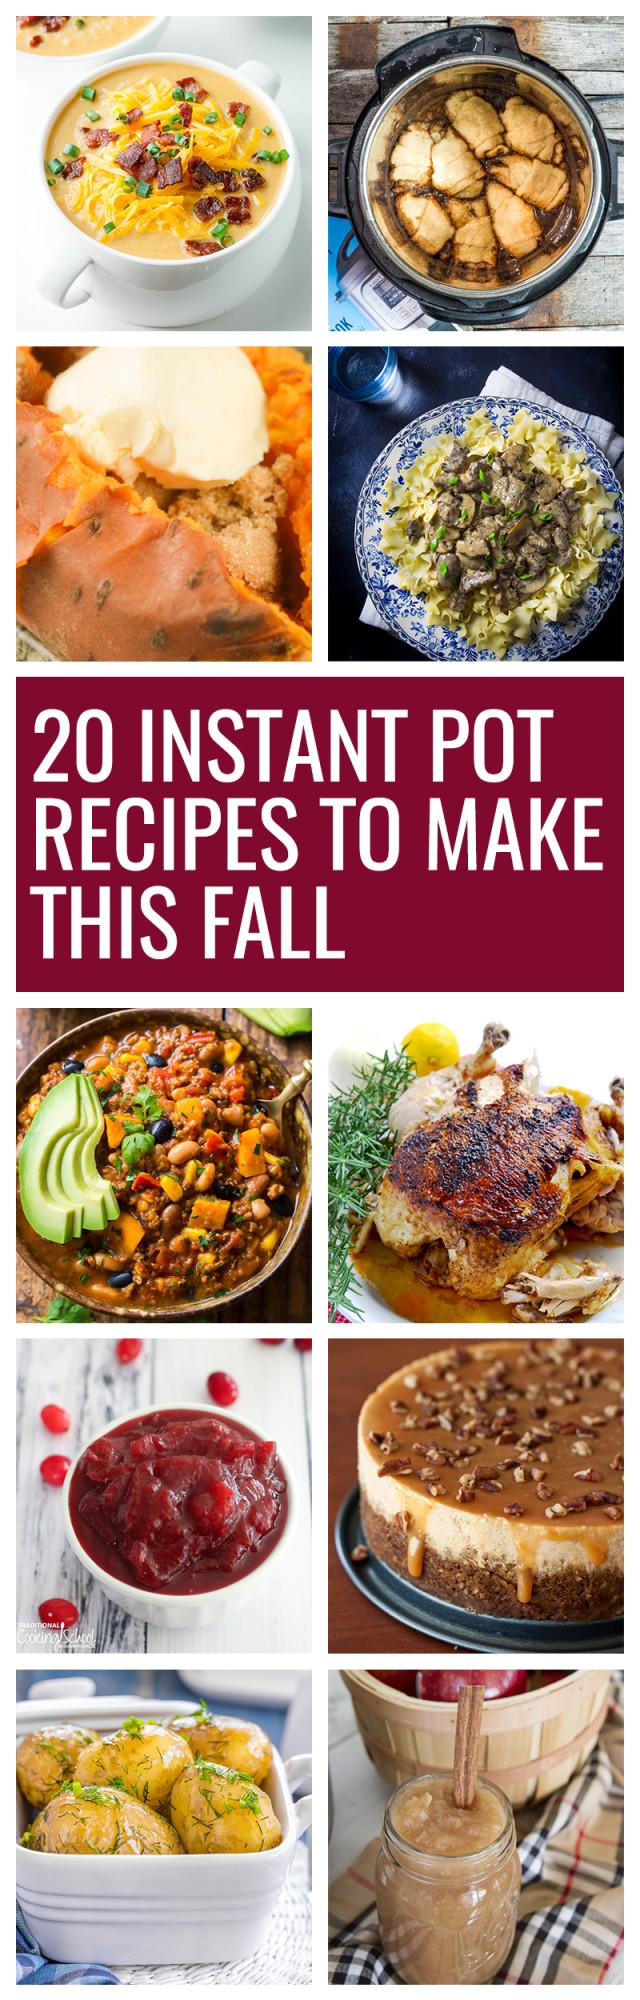 Fall Instant Pot Recipes  20 Fall Instant Pot Recipes